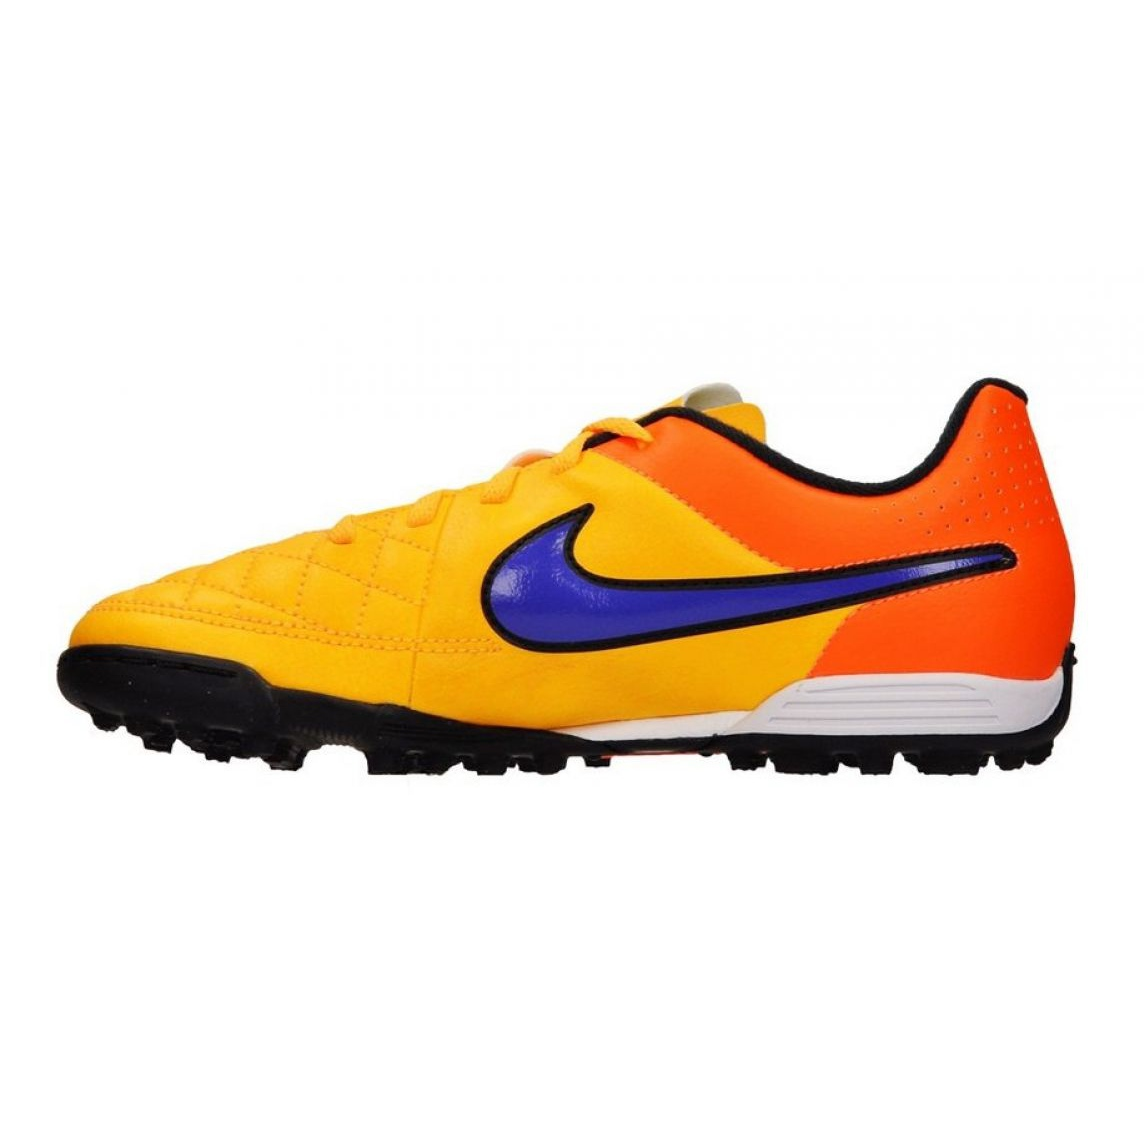 Nebu Competitivo Misericordioso  Football shoes Nike Tiempo Rio Ii Tf Jr 631524-858 multicolored orange -  ButyModne.pl